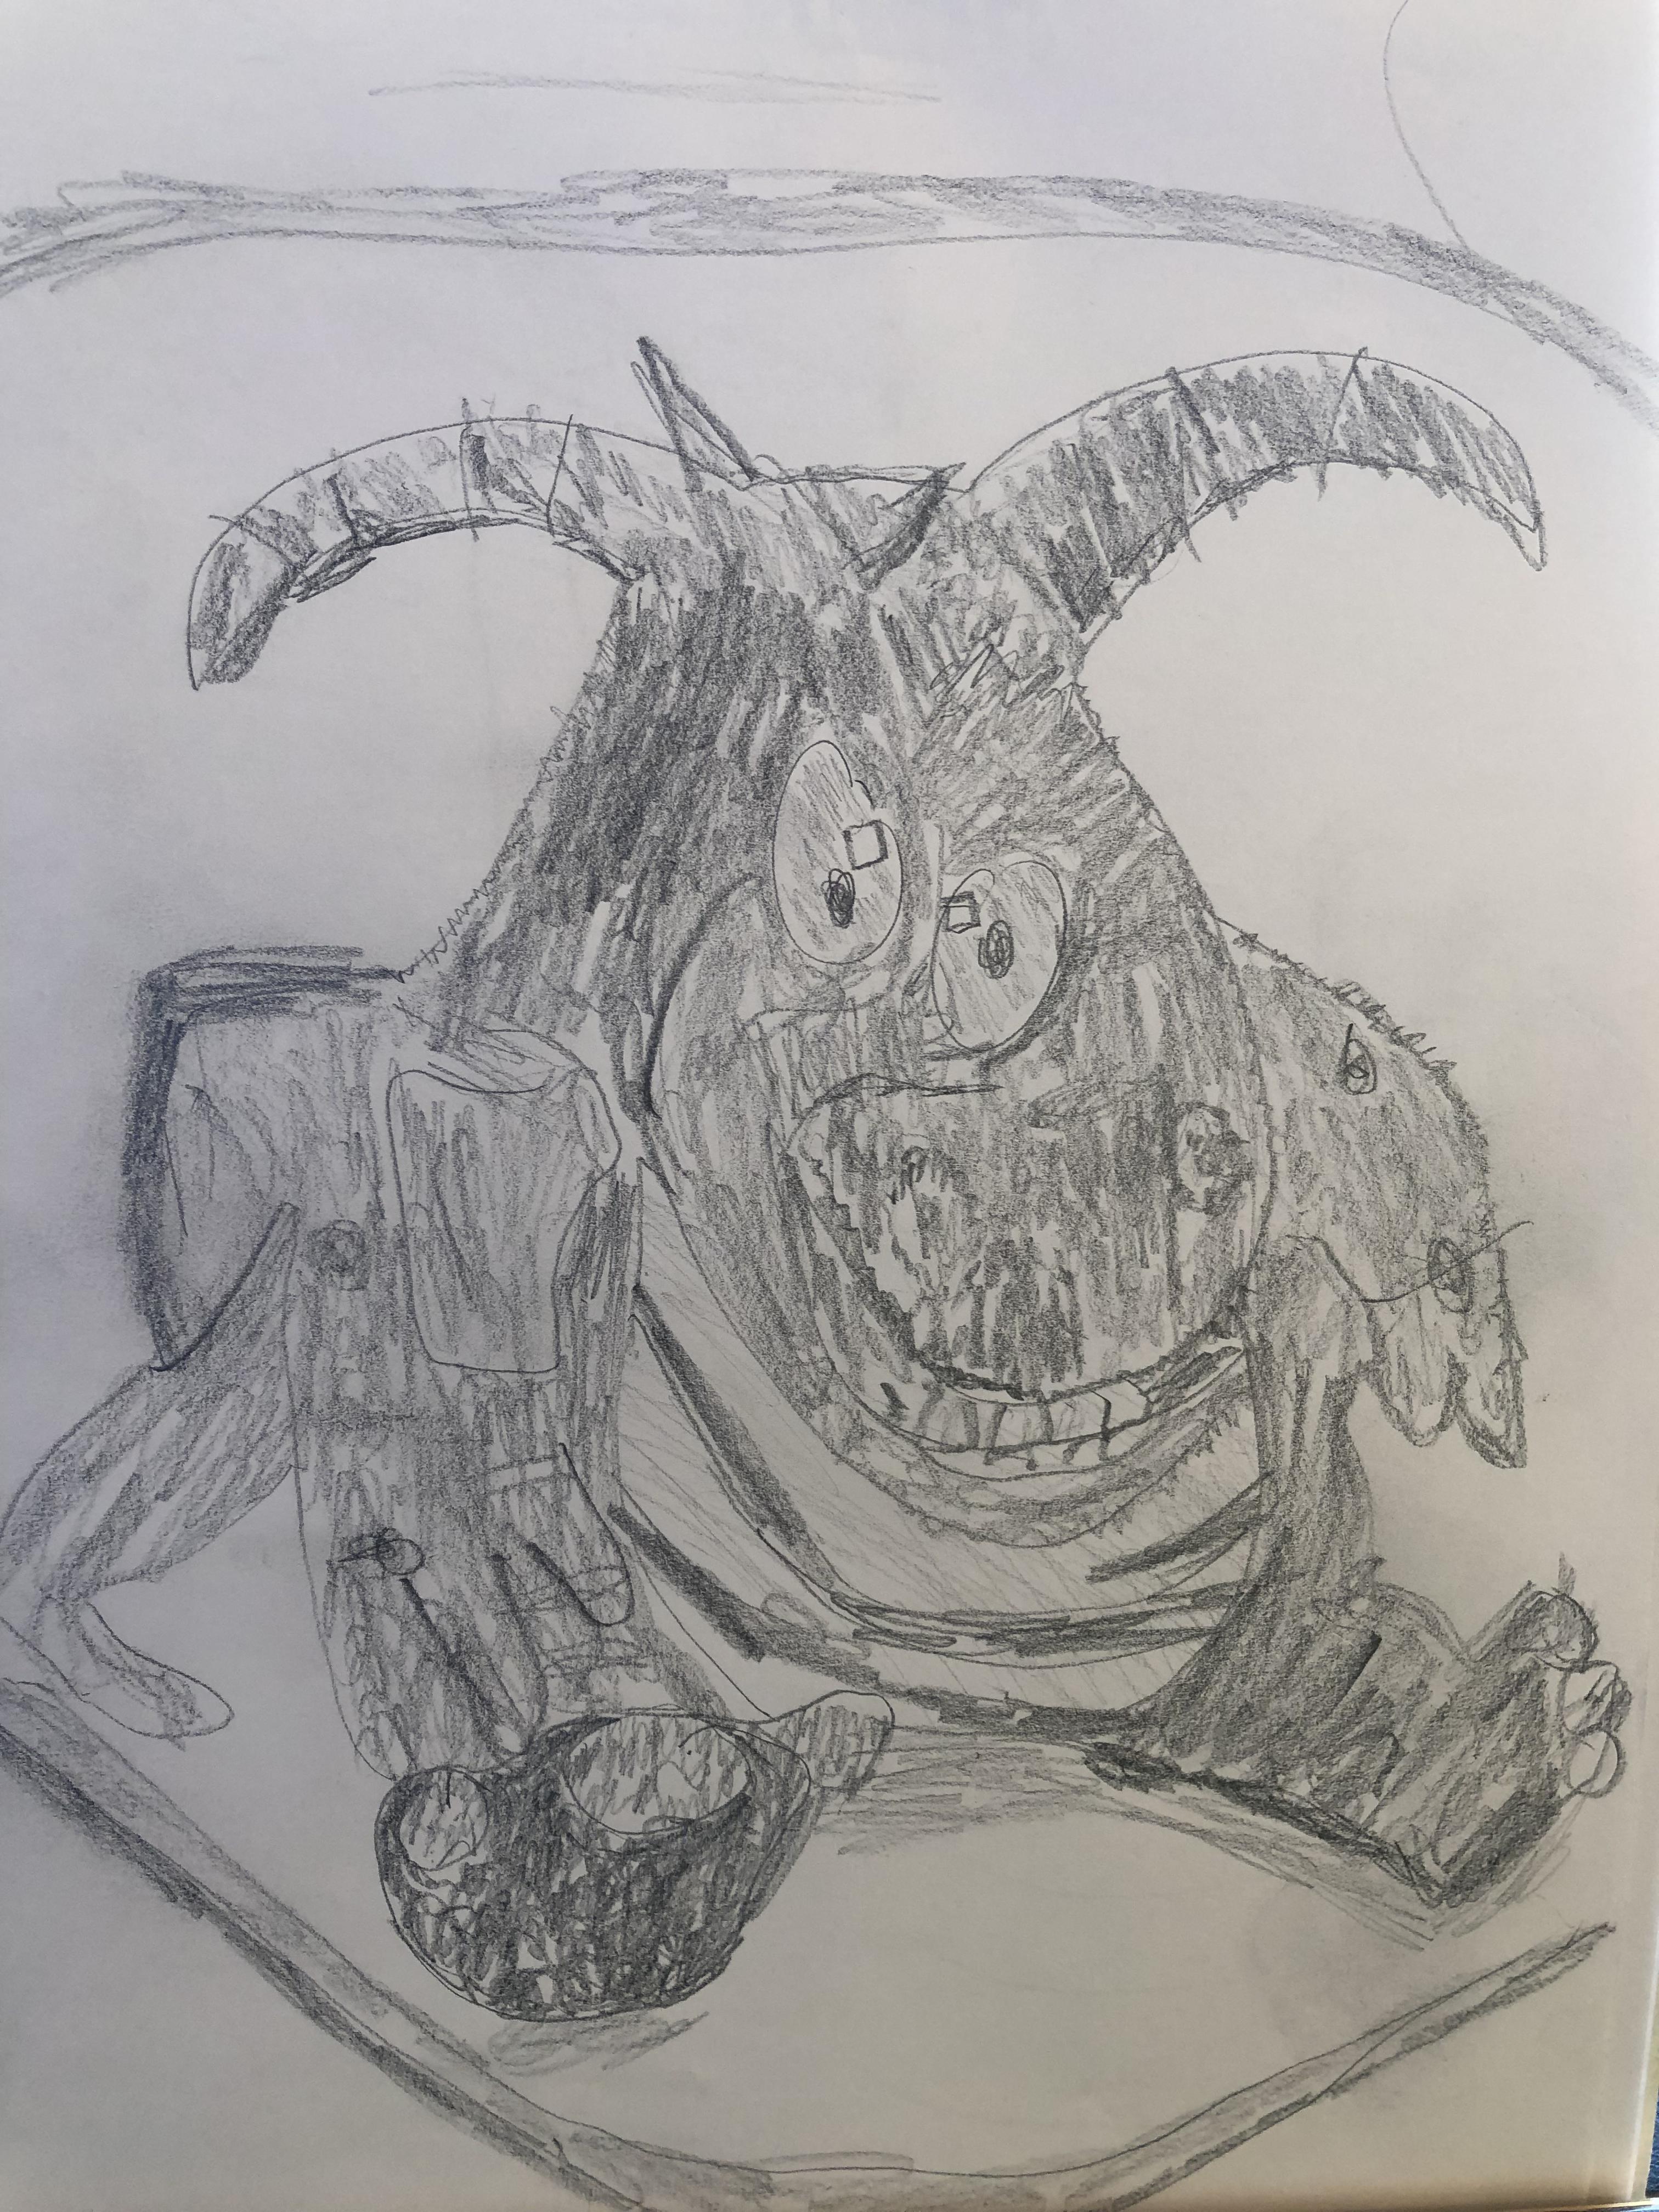 My Second Sketchbook by Mel Rosenberg - מל רוזנברג - Ourboox.com